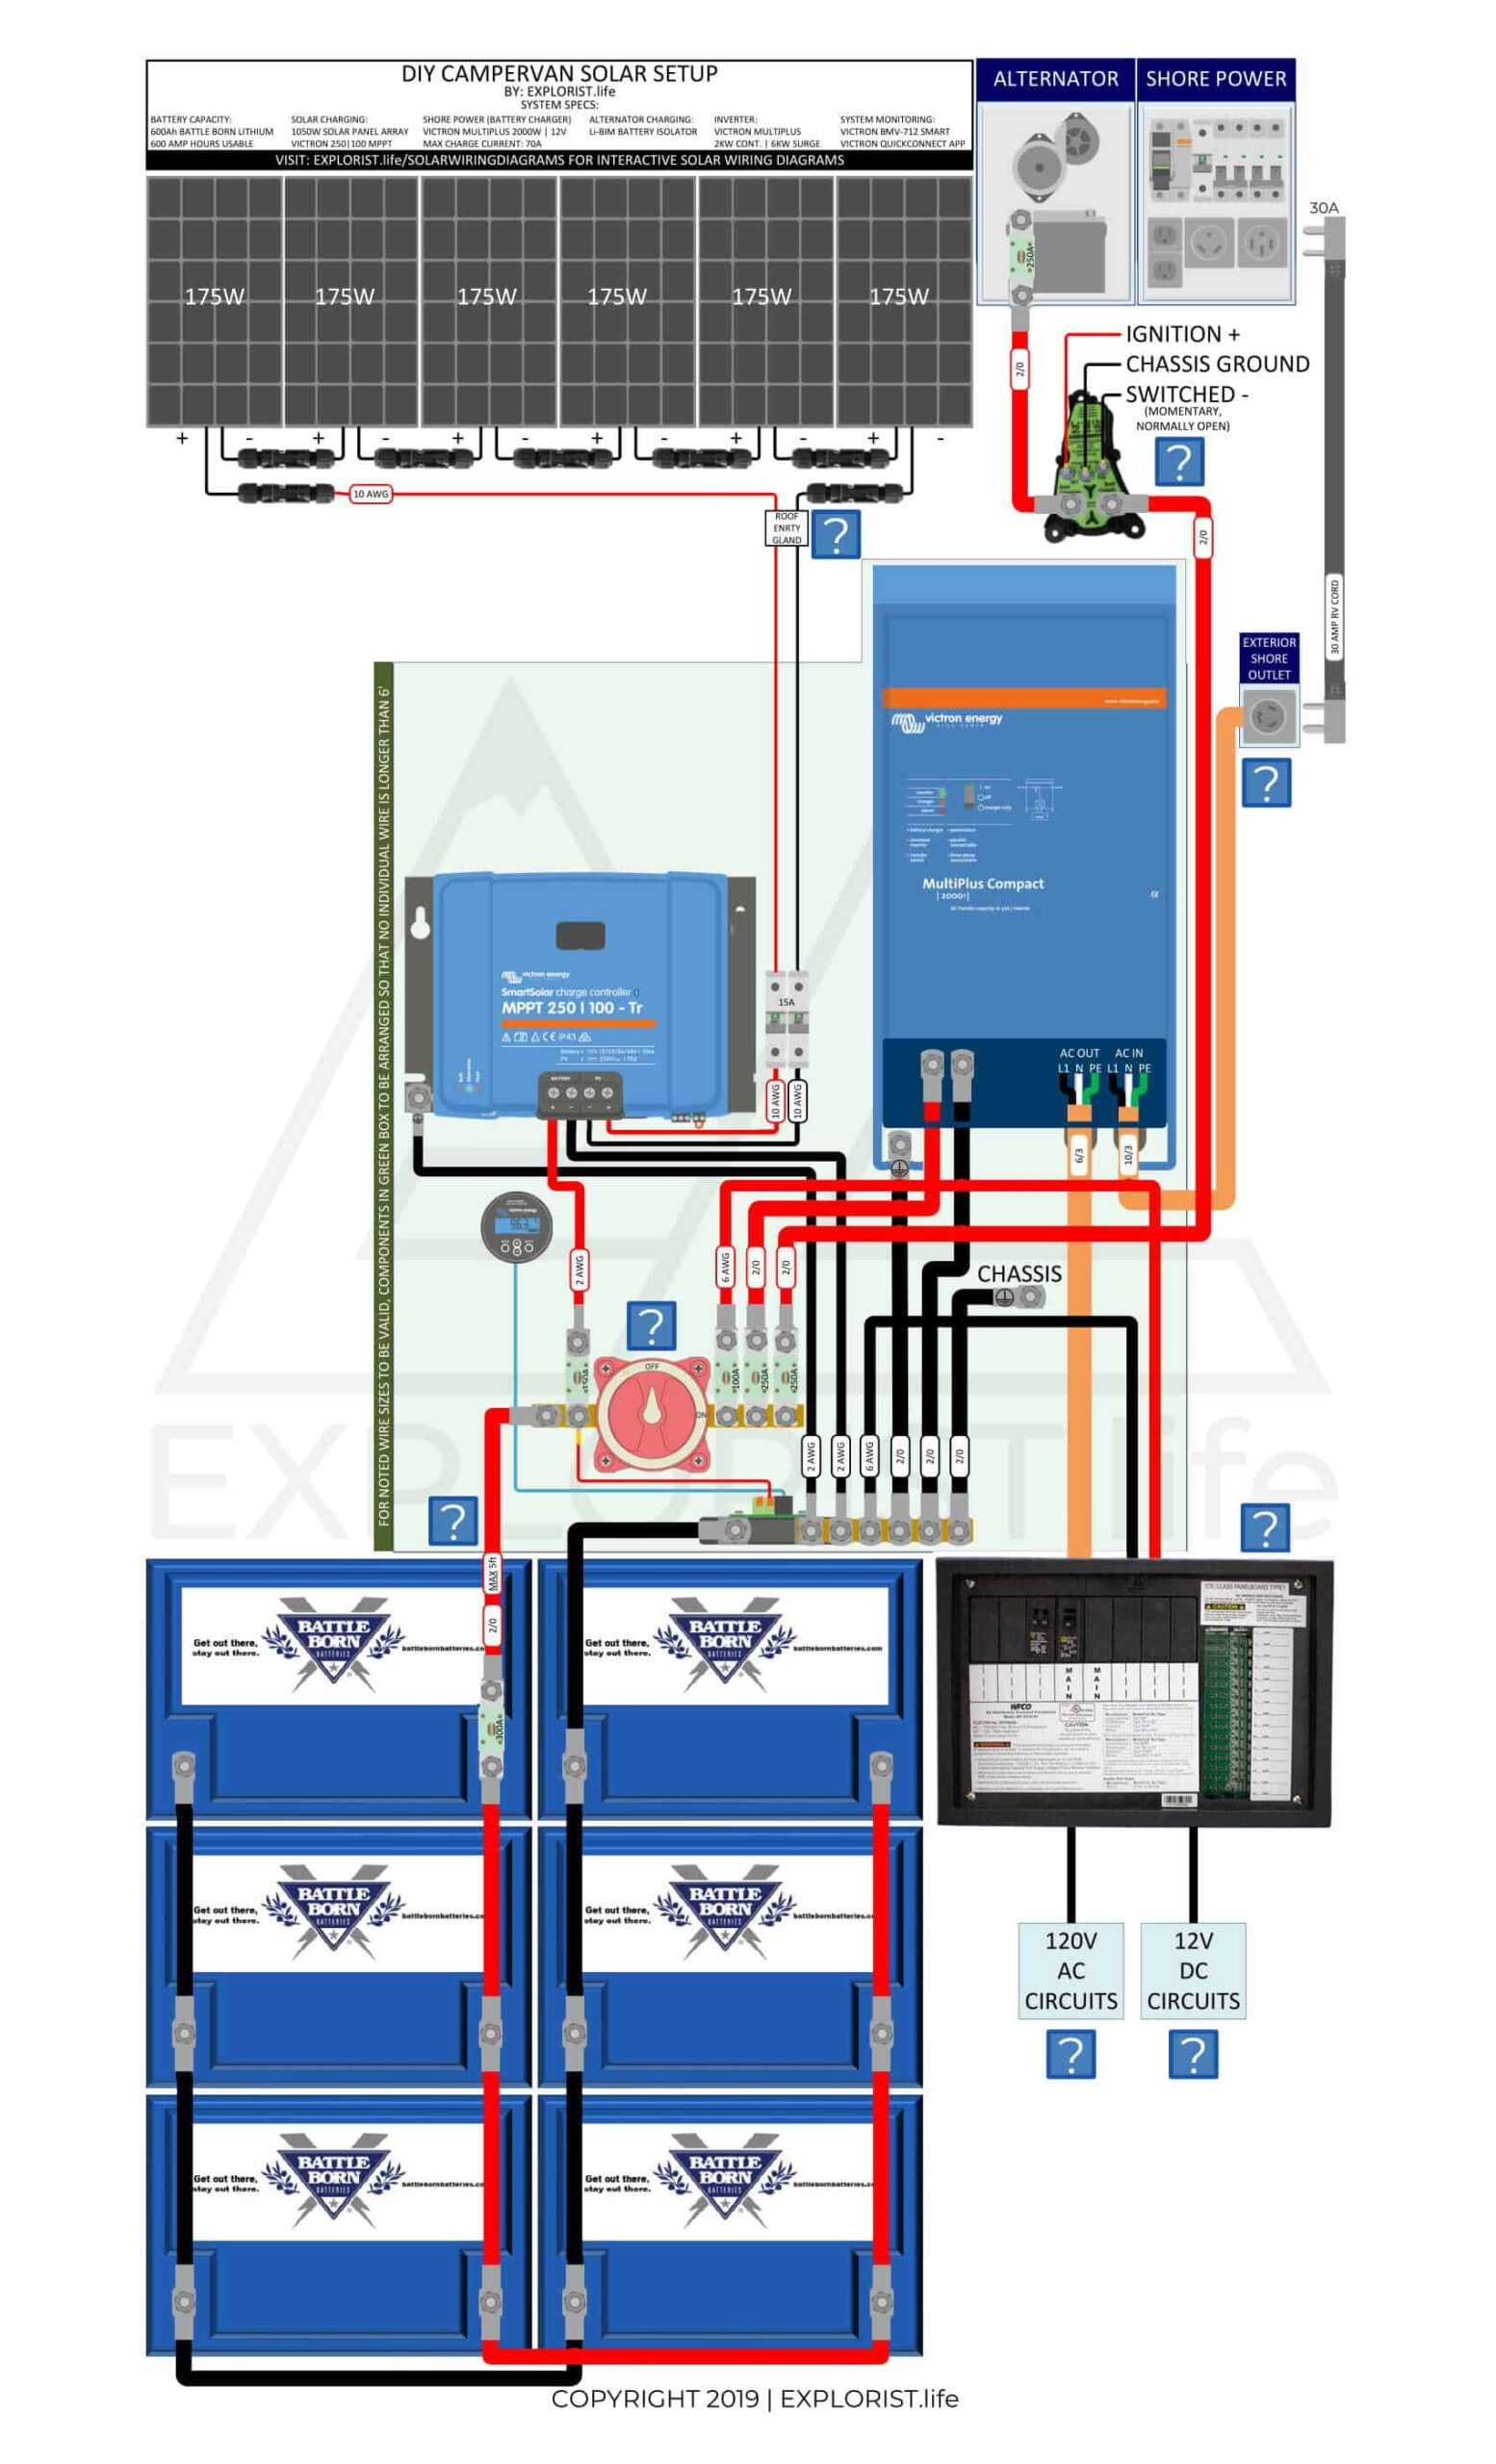 600Ah Lithium Battery Bank – 6x175W Solar – 2kW Inverter/Charger – Li-BIM Alternator Charging